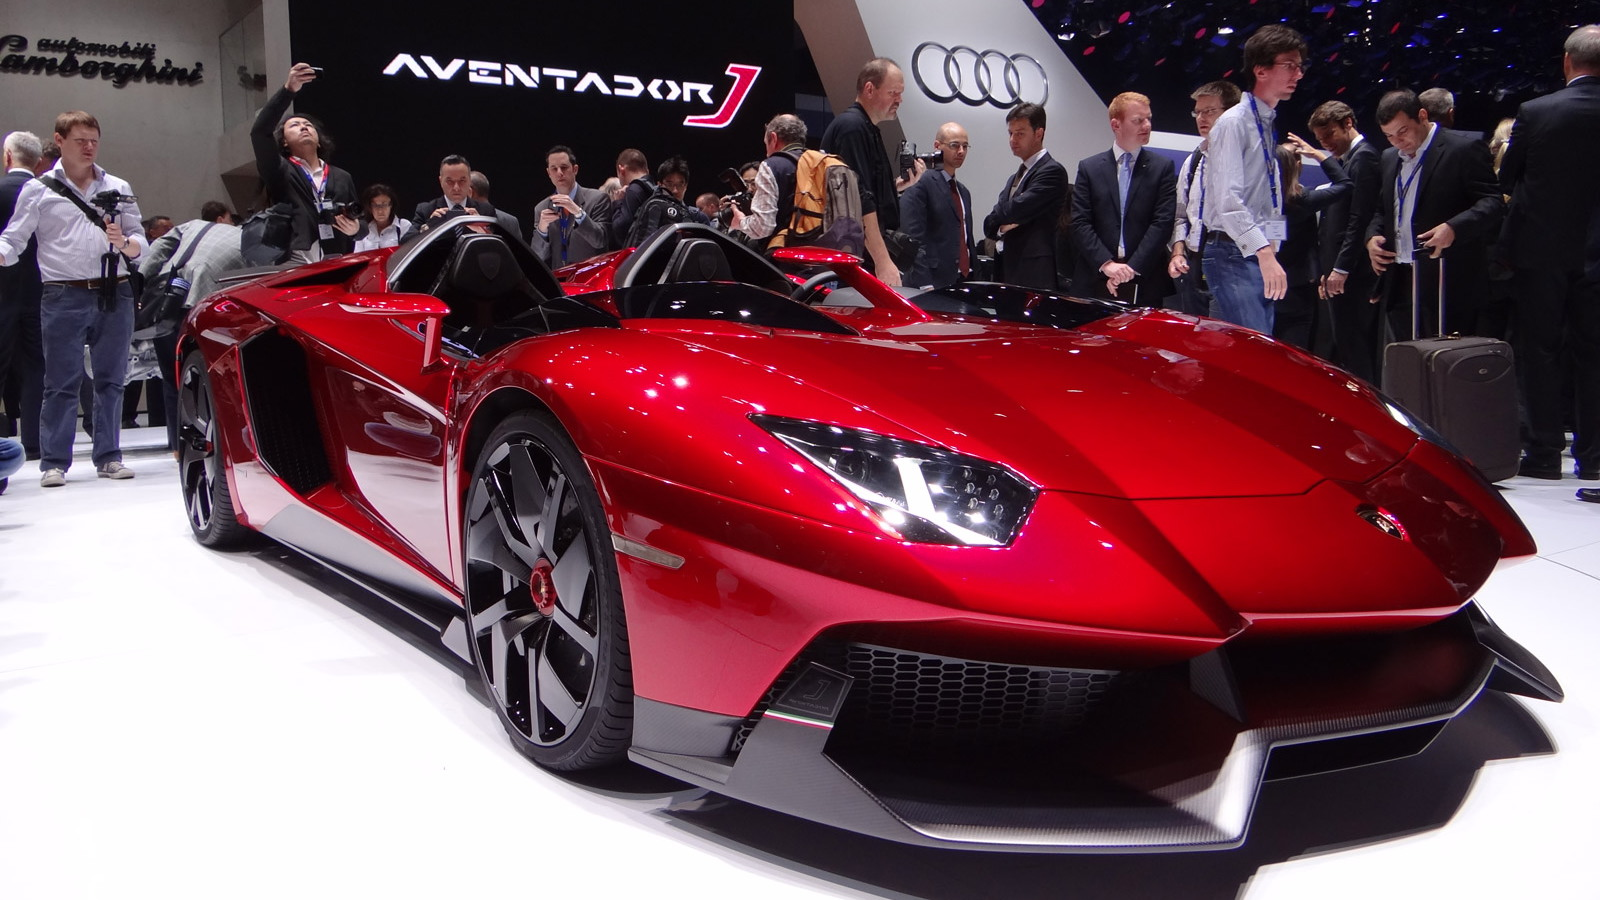 More Bespoke Lamborghinis On The Way